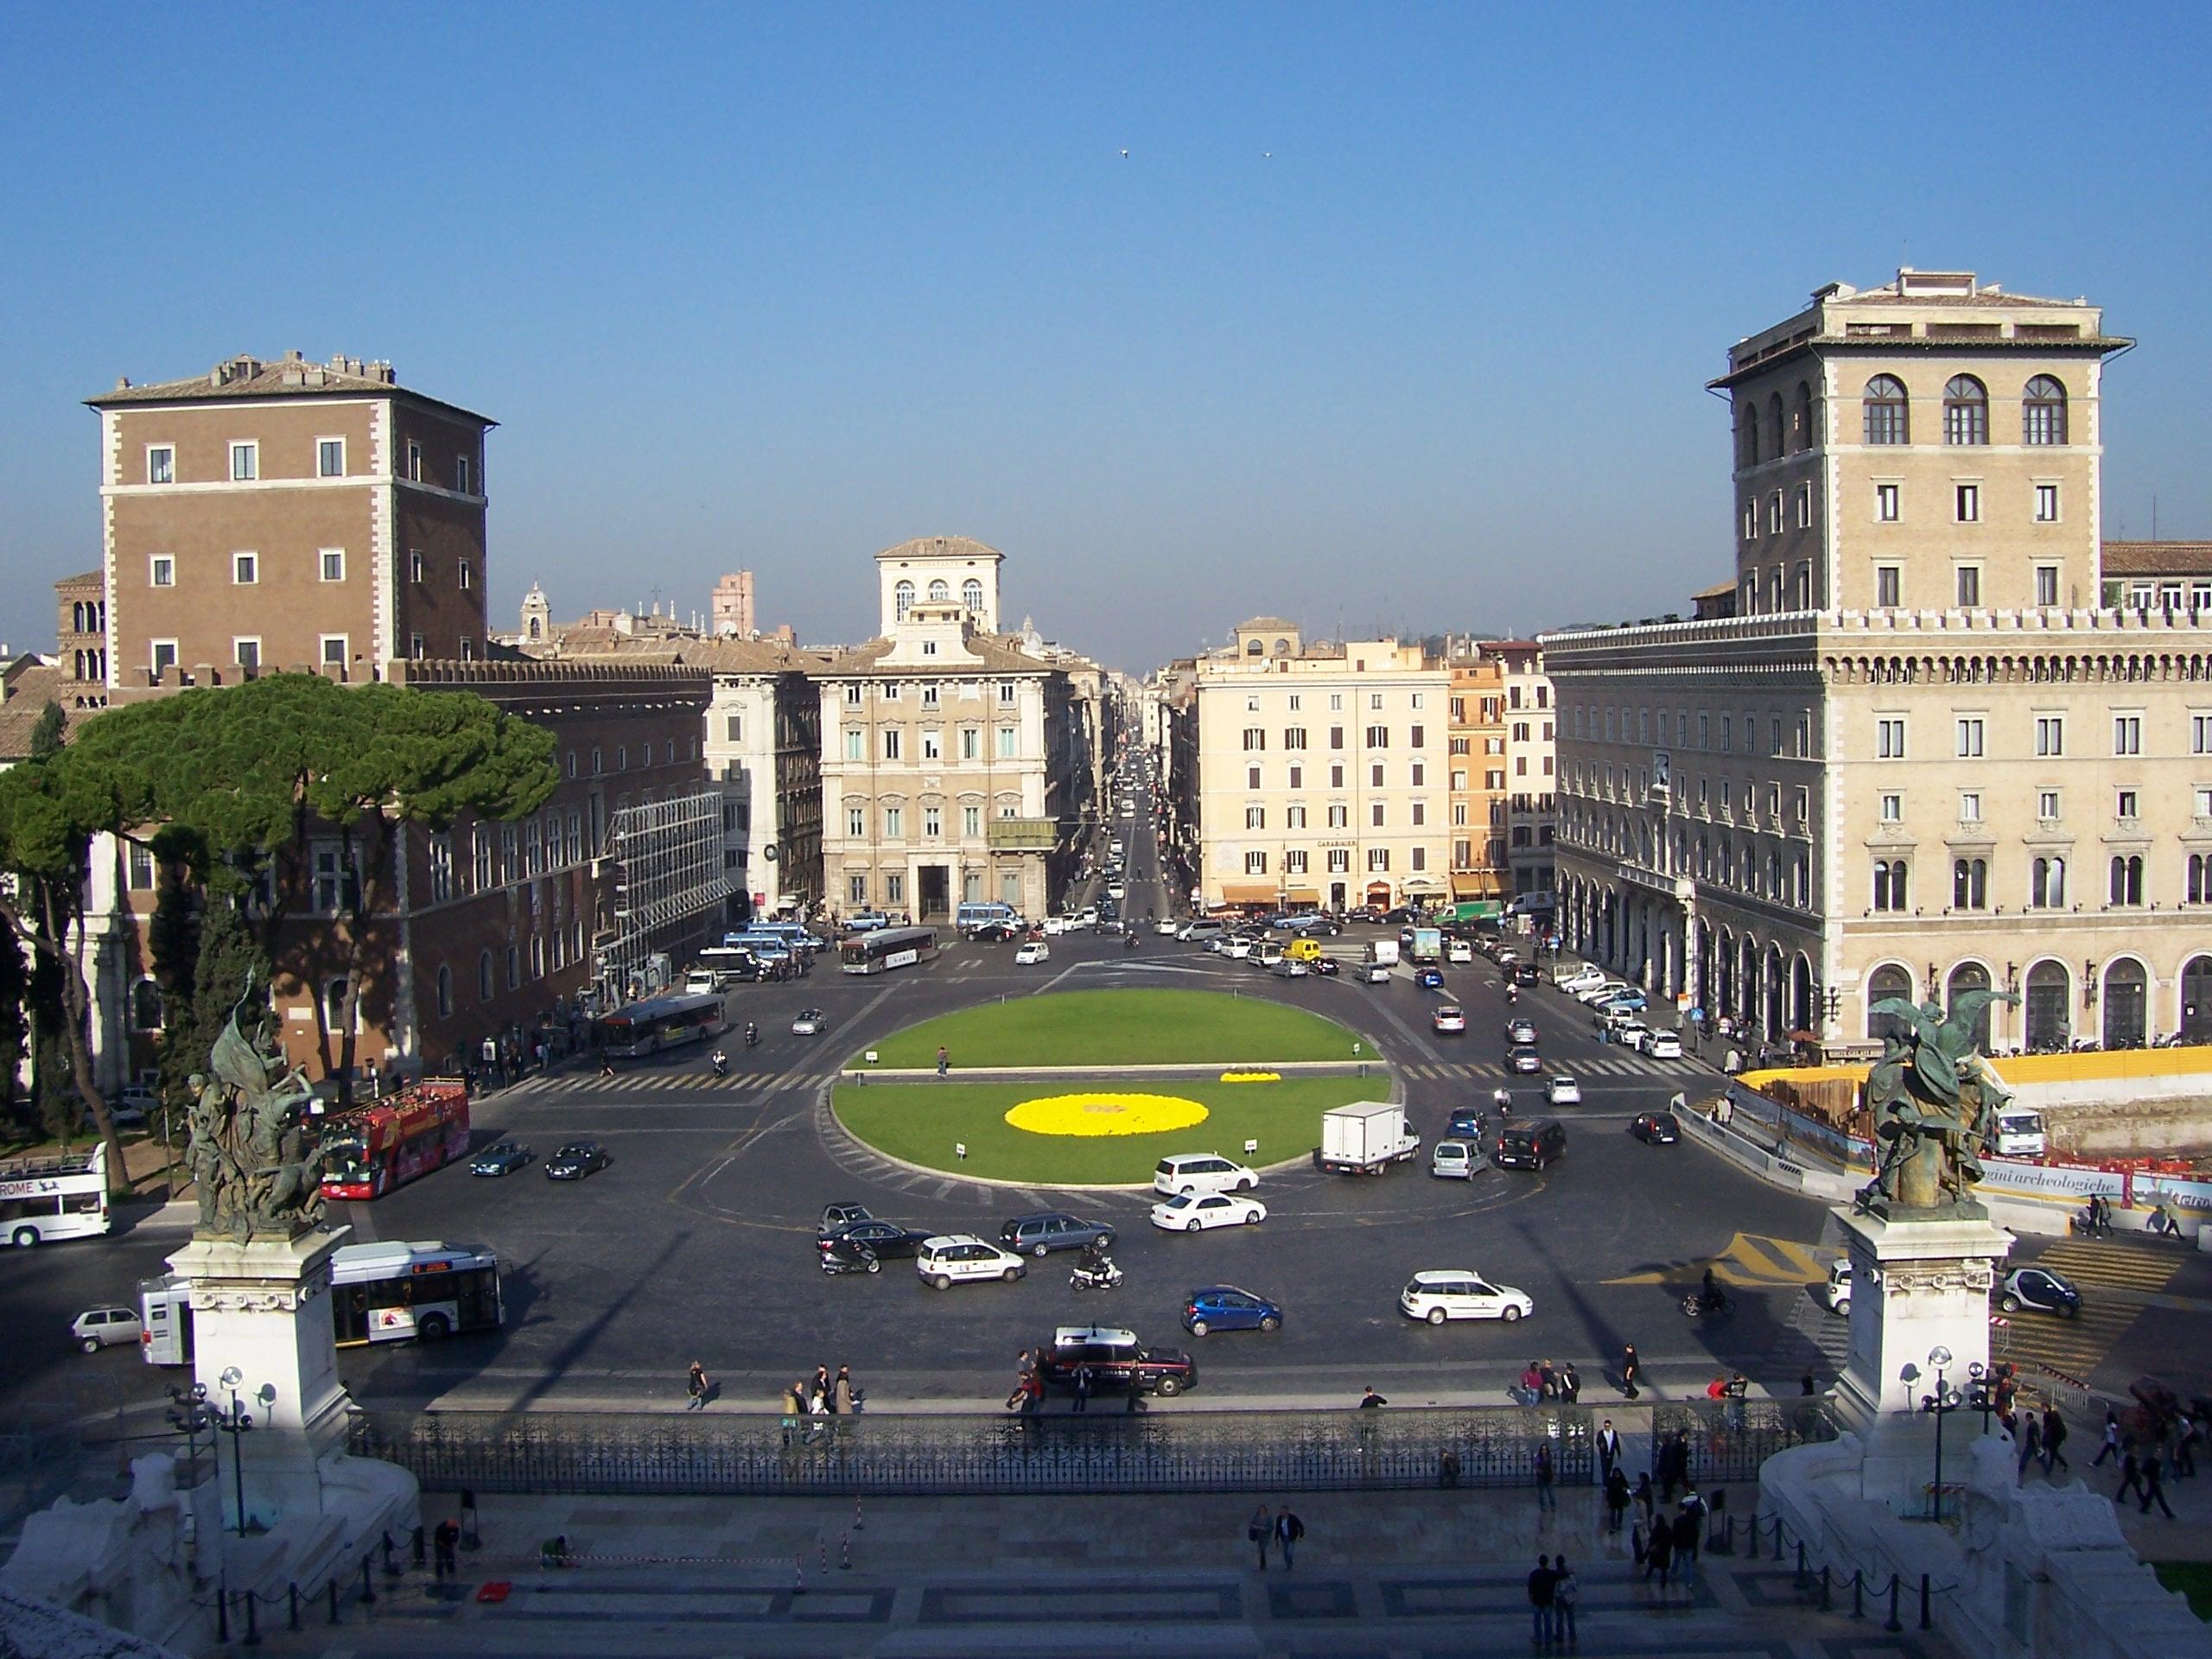 Hotel De Rome Dachterrasse Advent